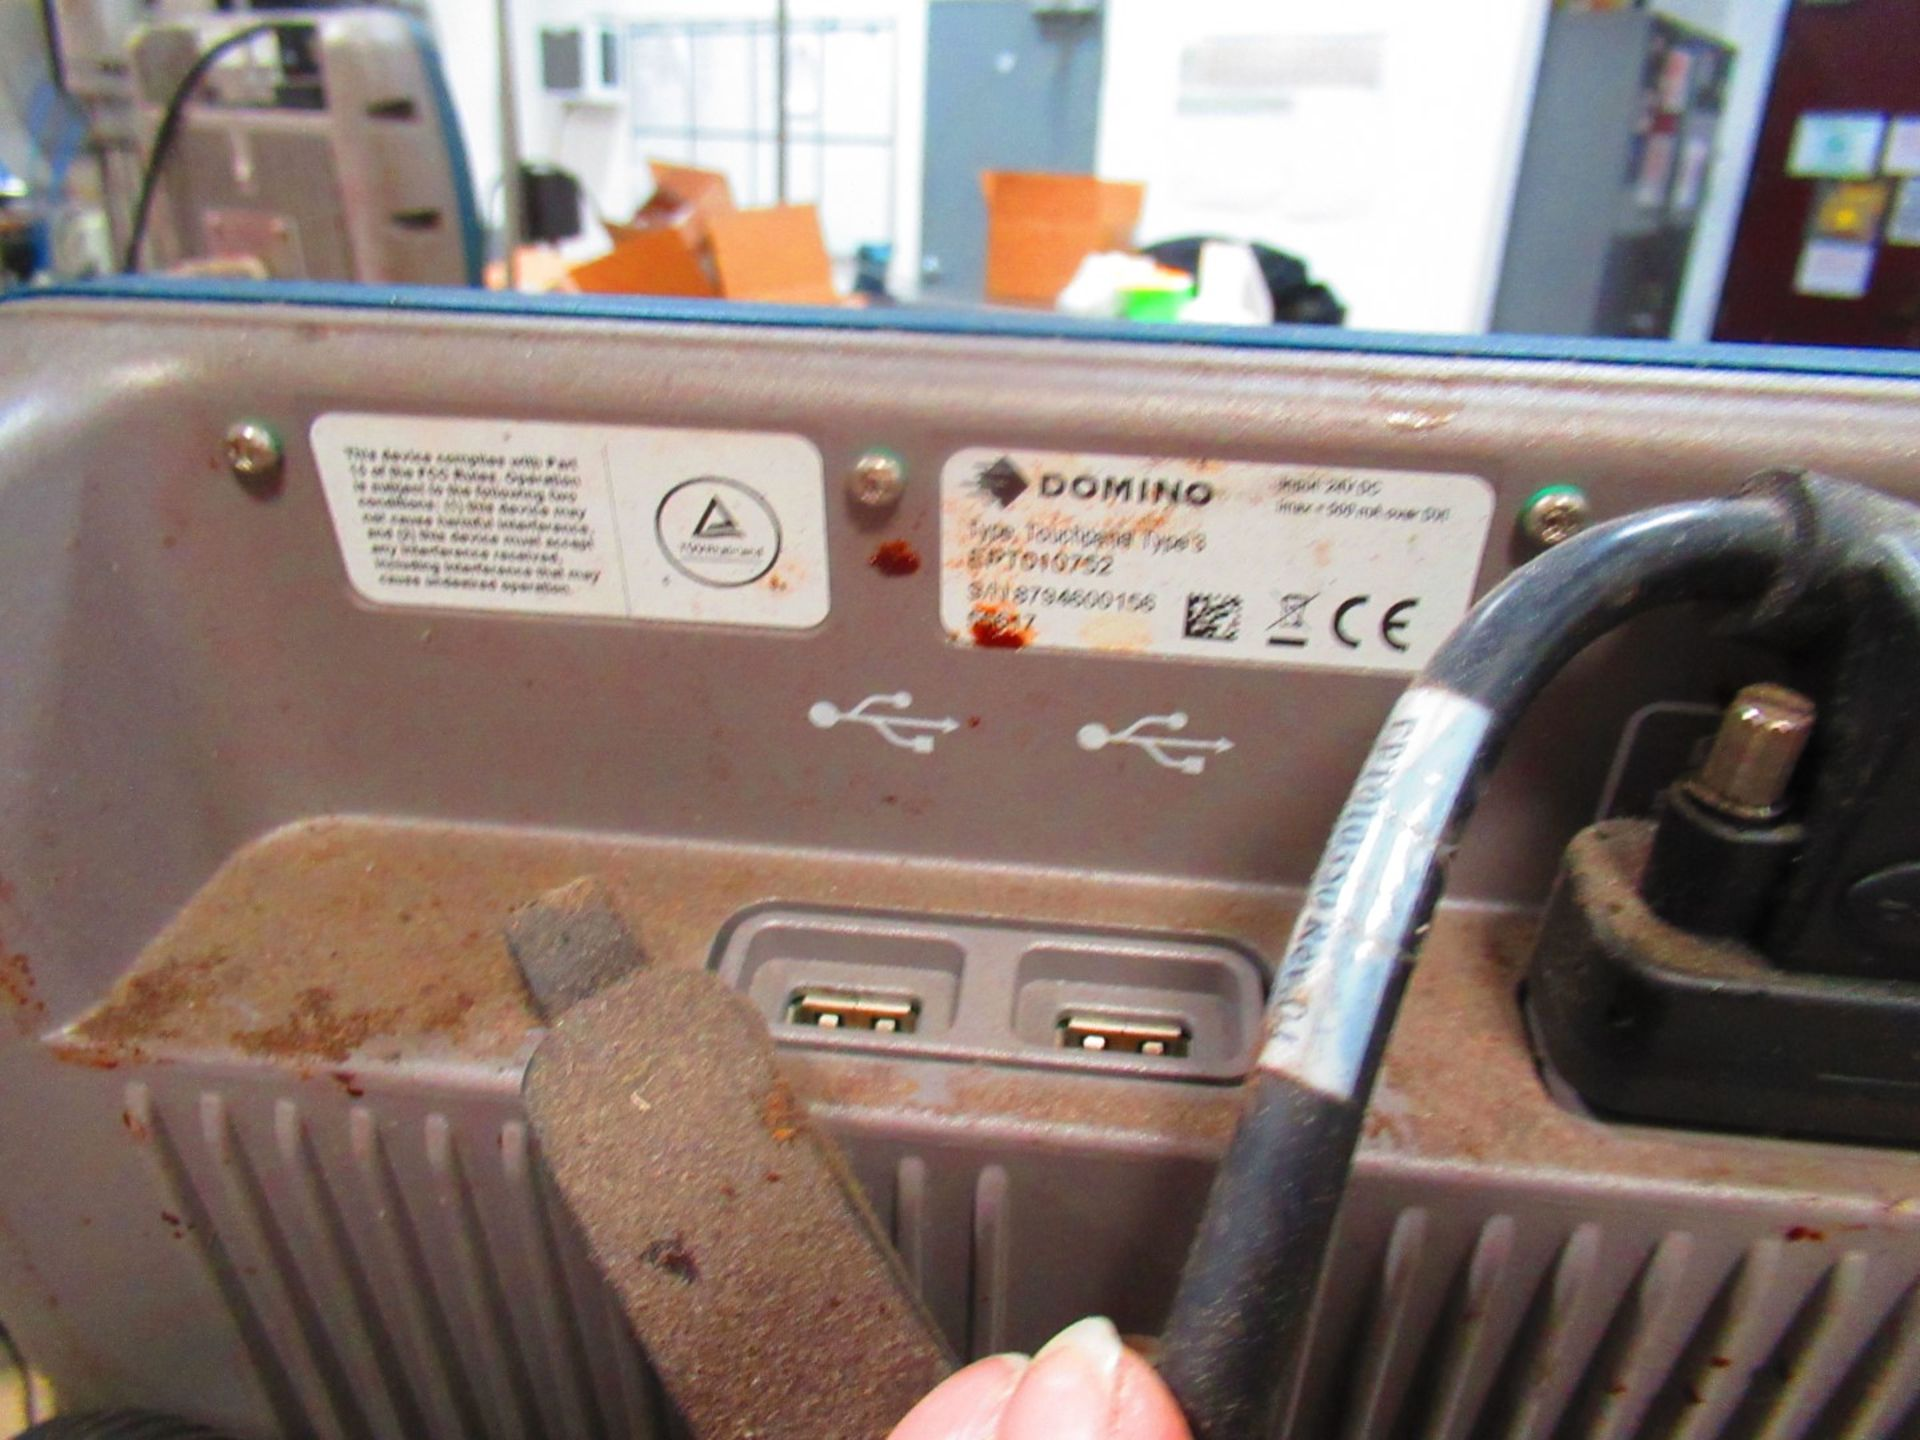 Thermal Printer - Image 8 of 8